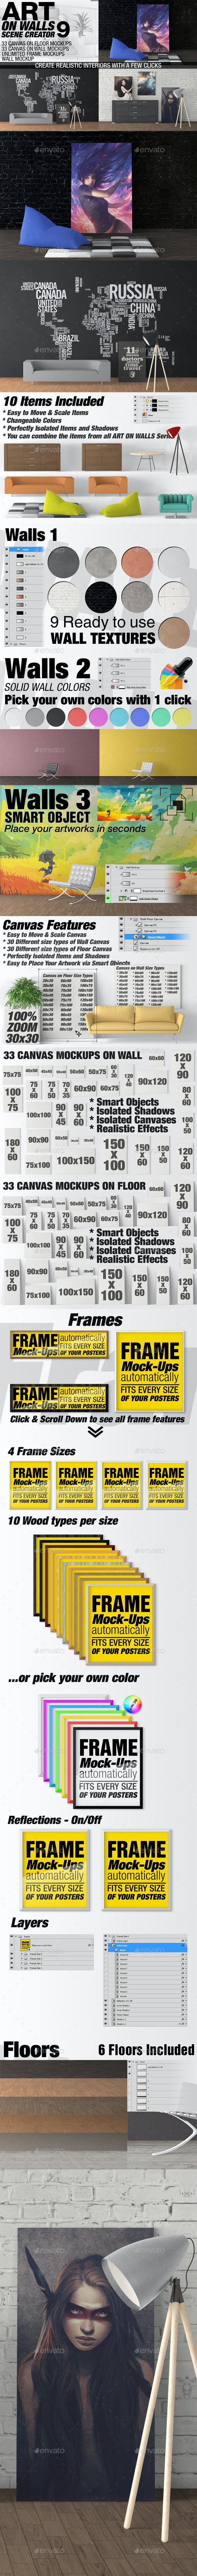 Art On Walls Mockup - Canvas Mockups - Frame Mockups - Wall Mockups Vol 9 - Miscellaneous Product Mock-Ups